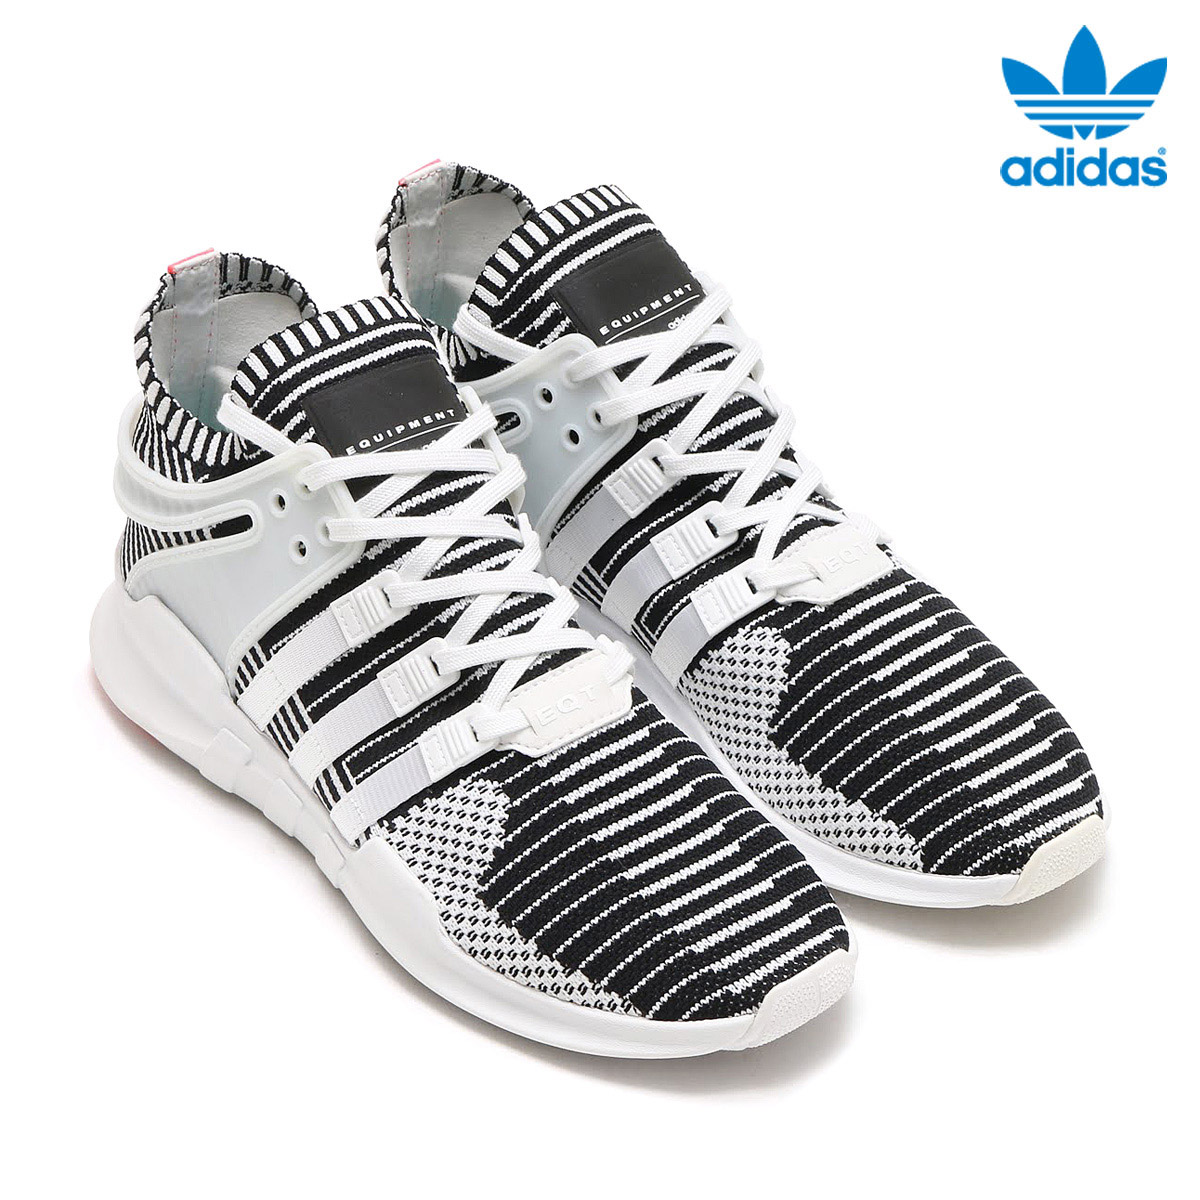 adidas Originals EQT SUPPORT ADV PK(アディダス オリジナルス エキップメント サポート) (Running White/Running White/Turbo)【メンズサイズ】17SS-I